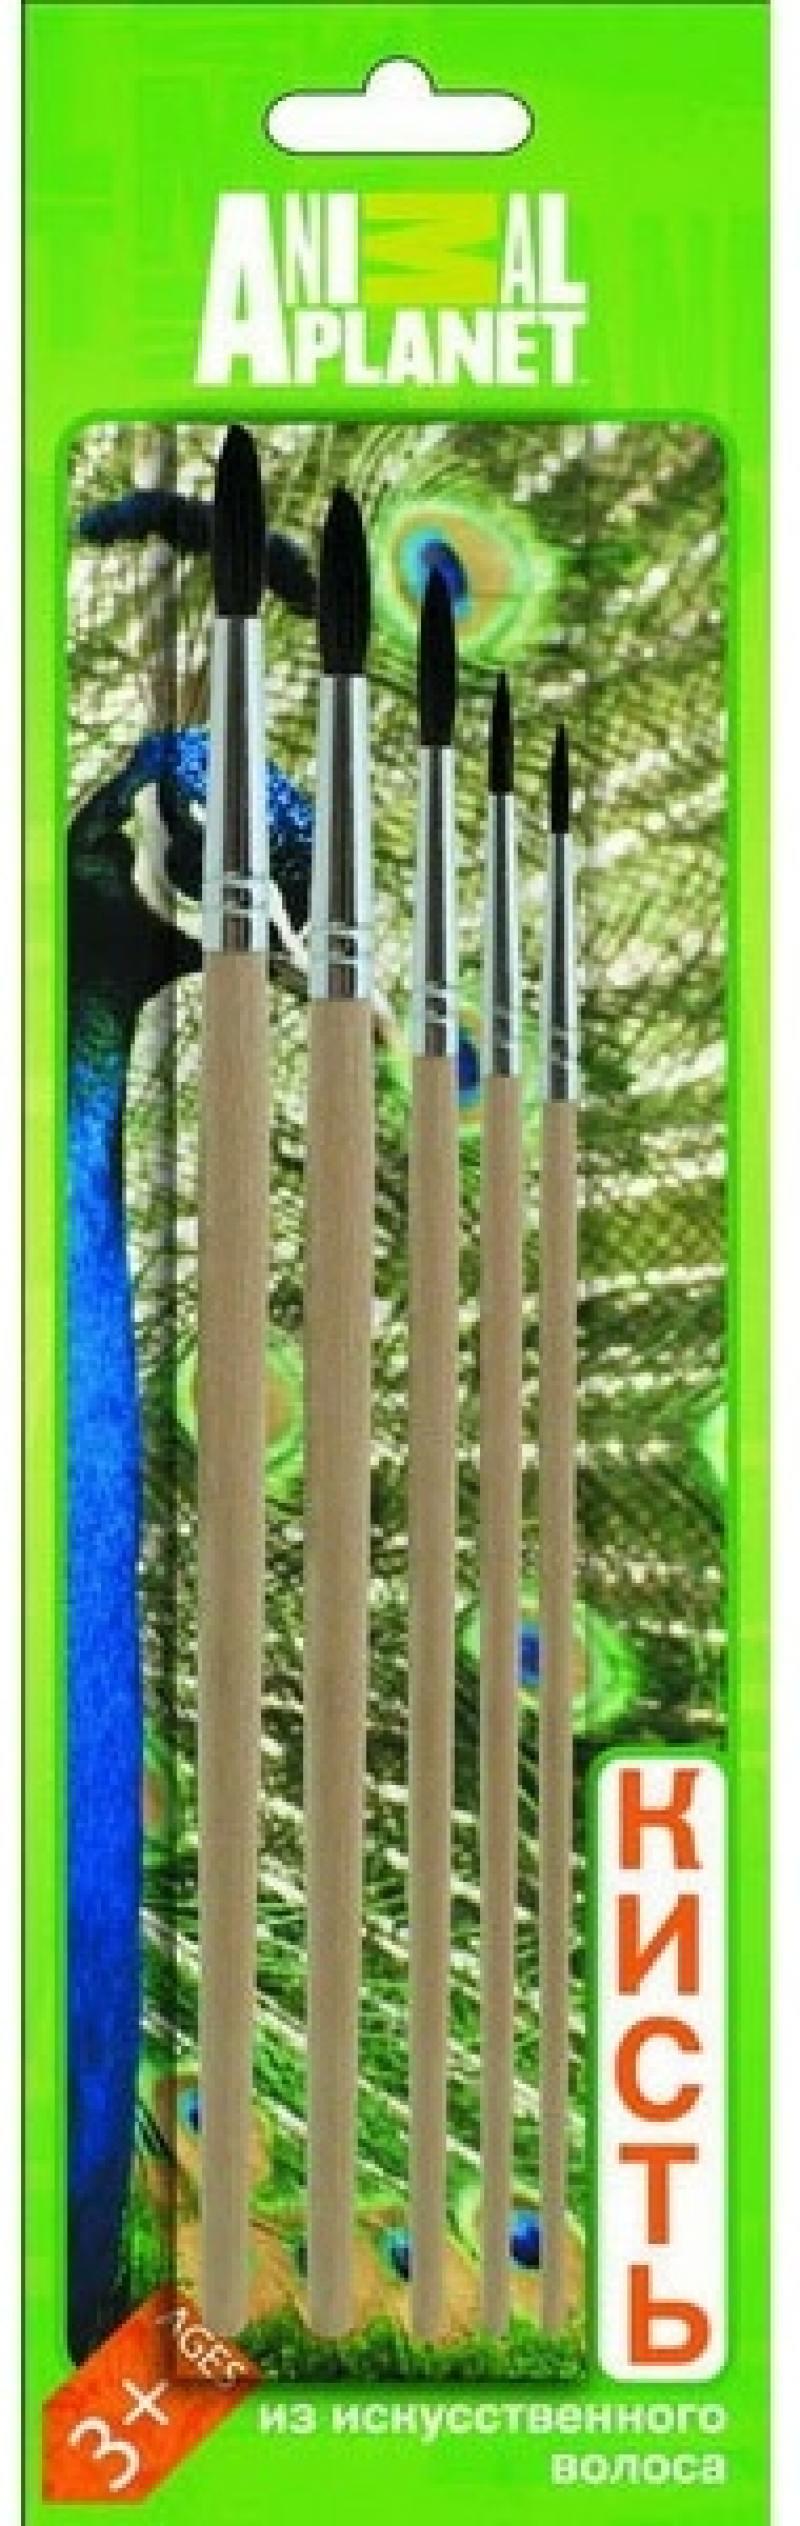 Набор кистей СИНТЕТИЧЕСКИЙ ВОЛОС ANIMAL PLANET, круглые, №1,2,3,4,5, блистер с е/п AP-ABS005I набор кистей action dc comics пони 2 4 6 блистер с е п